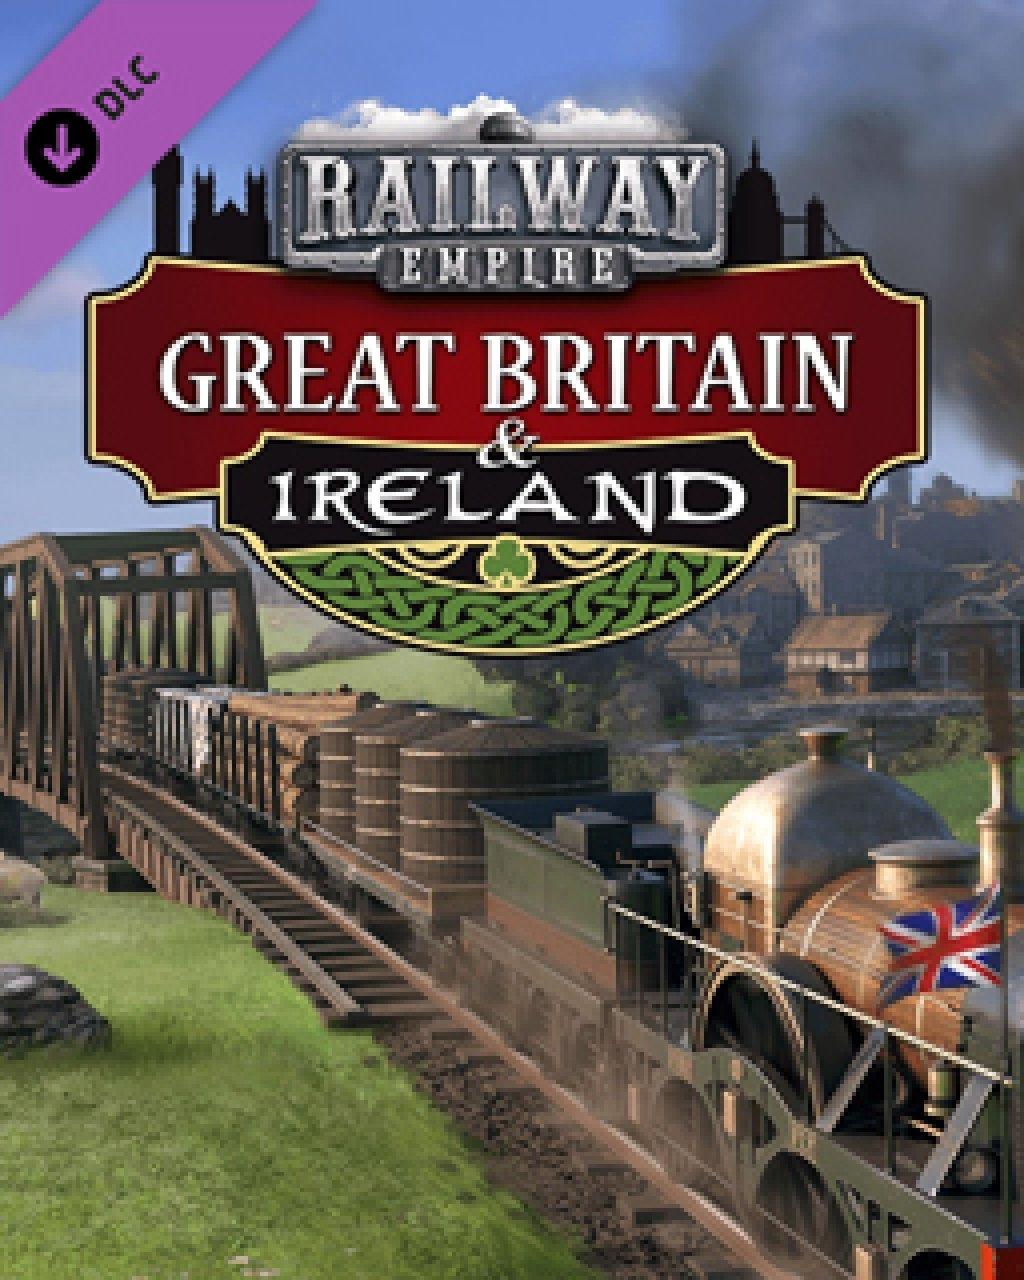 Railway Empire Great Britain & Ireland